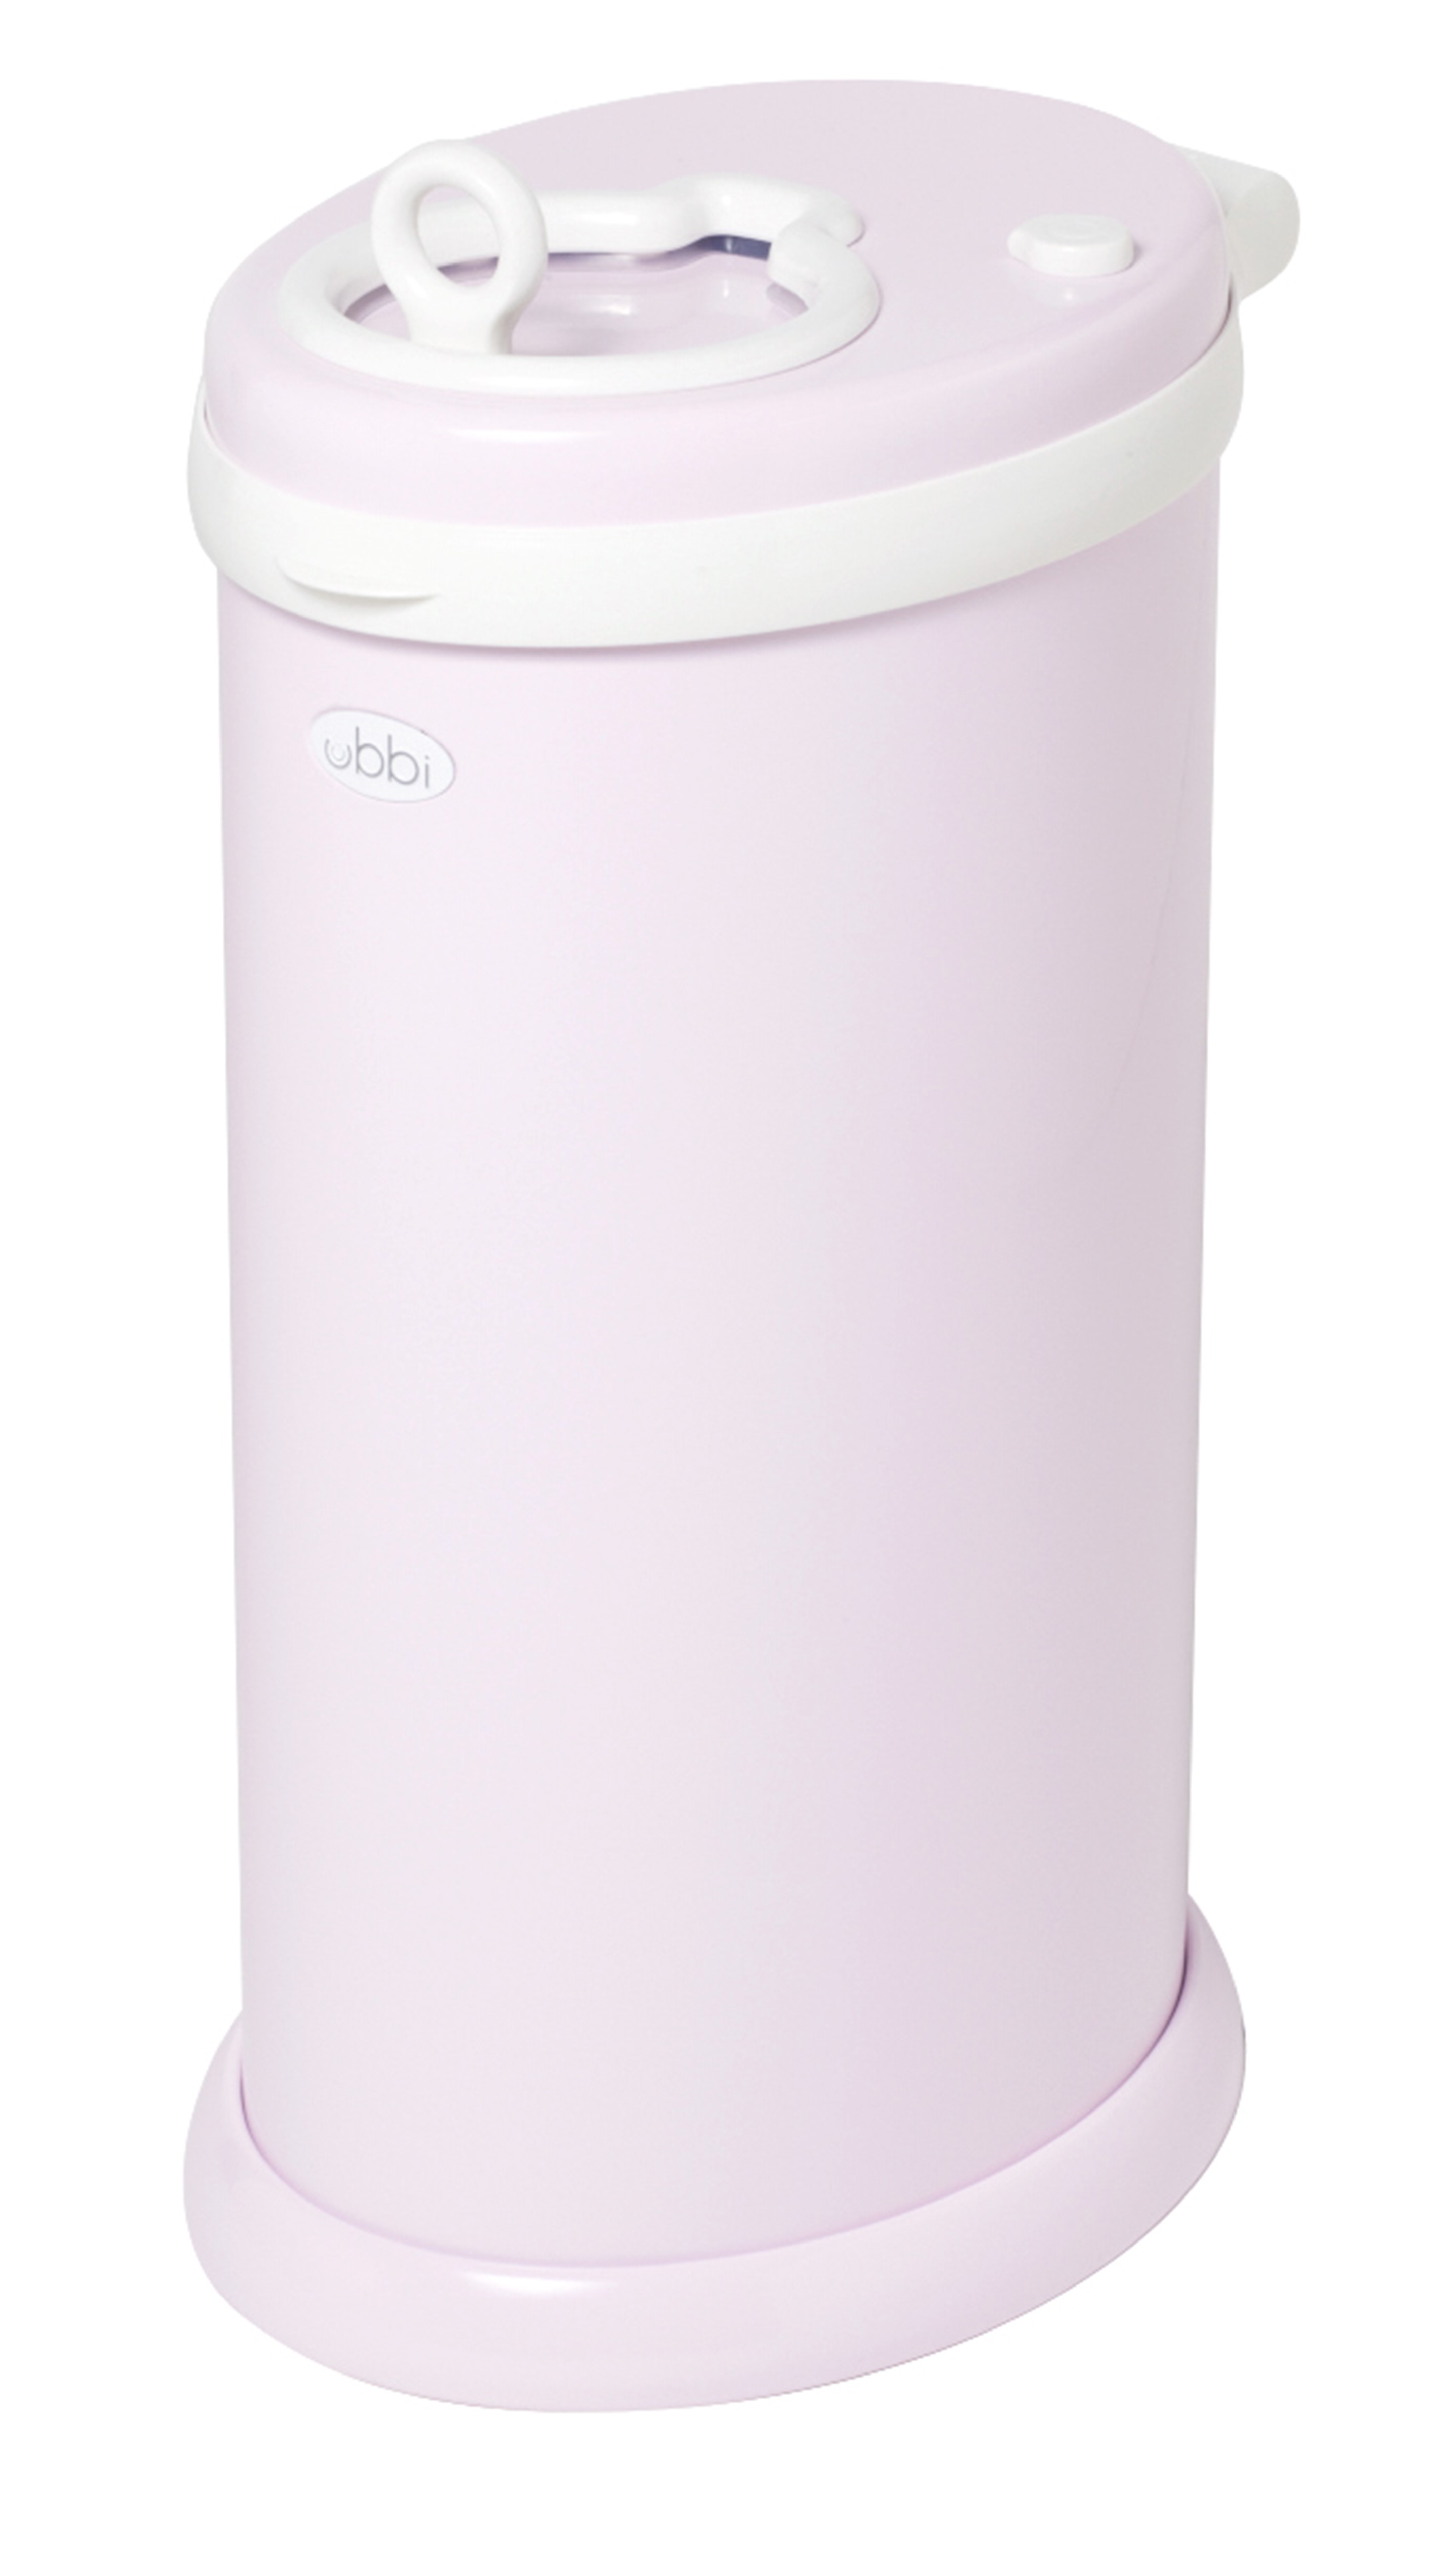 Ubbi Steel Diaper Pail, Light Pink by Ubbi